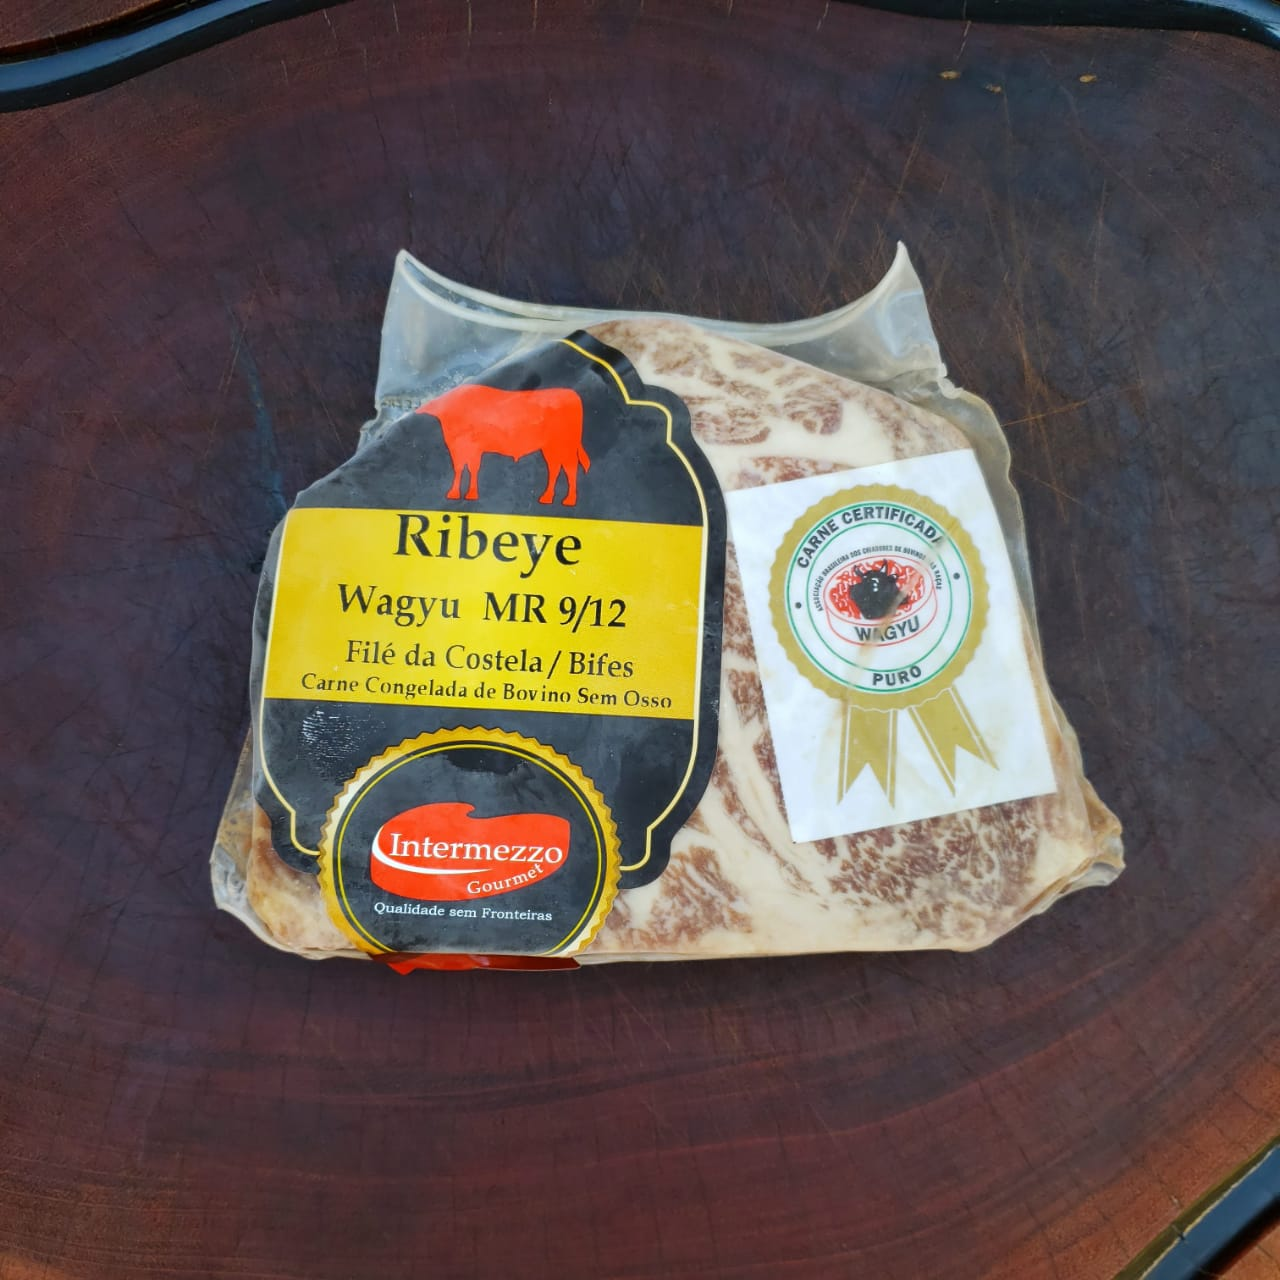 Wagyu - Ribeye - 9/12 - Intermezzo - 370g  - Partiu Churras